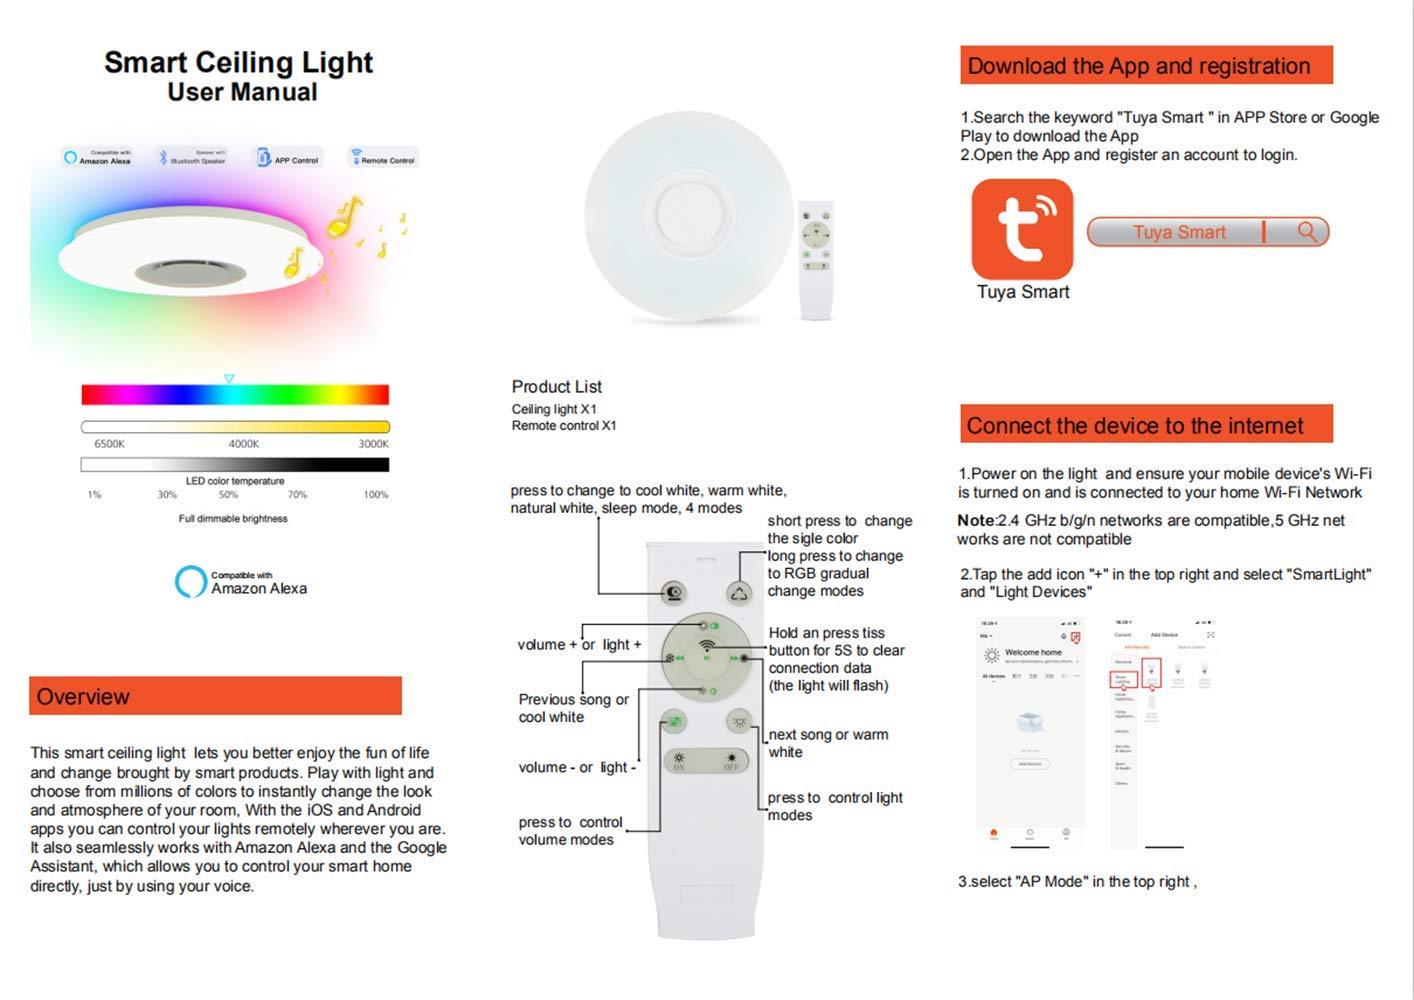 Negro MOHOO L/ápiz 3D Inteligente Pluma de Impresi/ón Cuarta Generaci/ón Dibujo en 3D USB para Dibujo de Artes Decorativos en 3D con 2 Filamentos de PLA Regalo Creativo para Ni/ños o Adultos